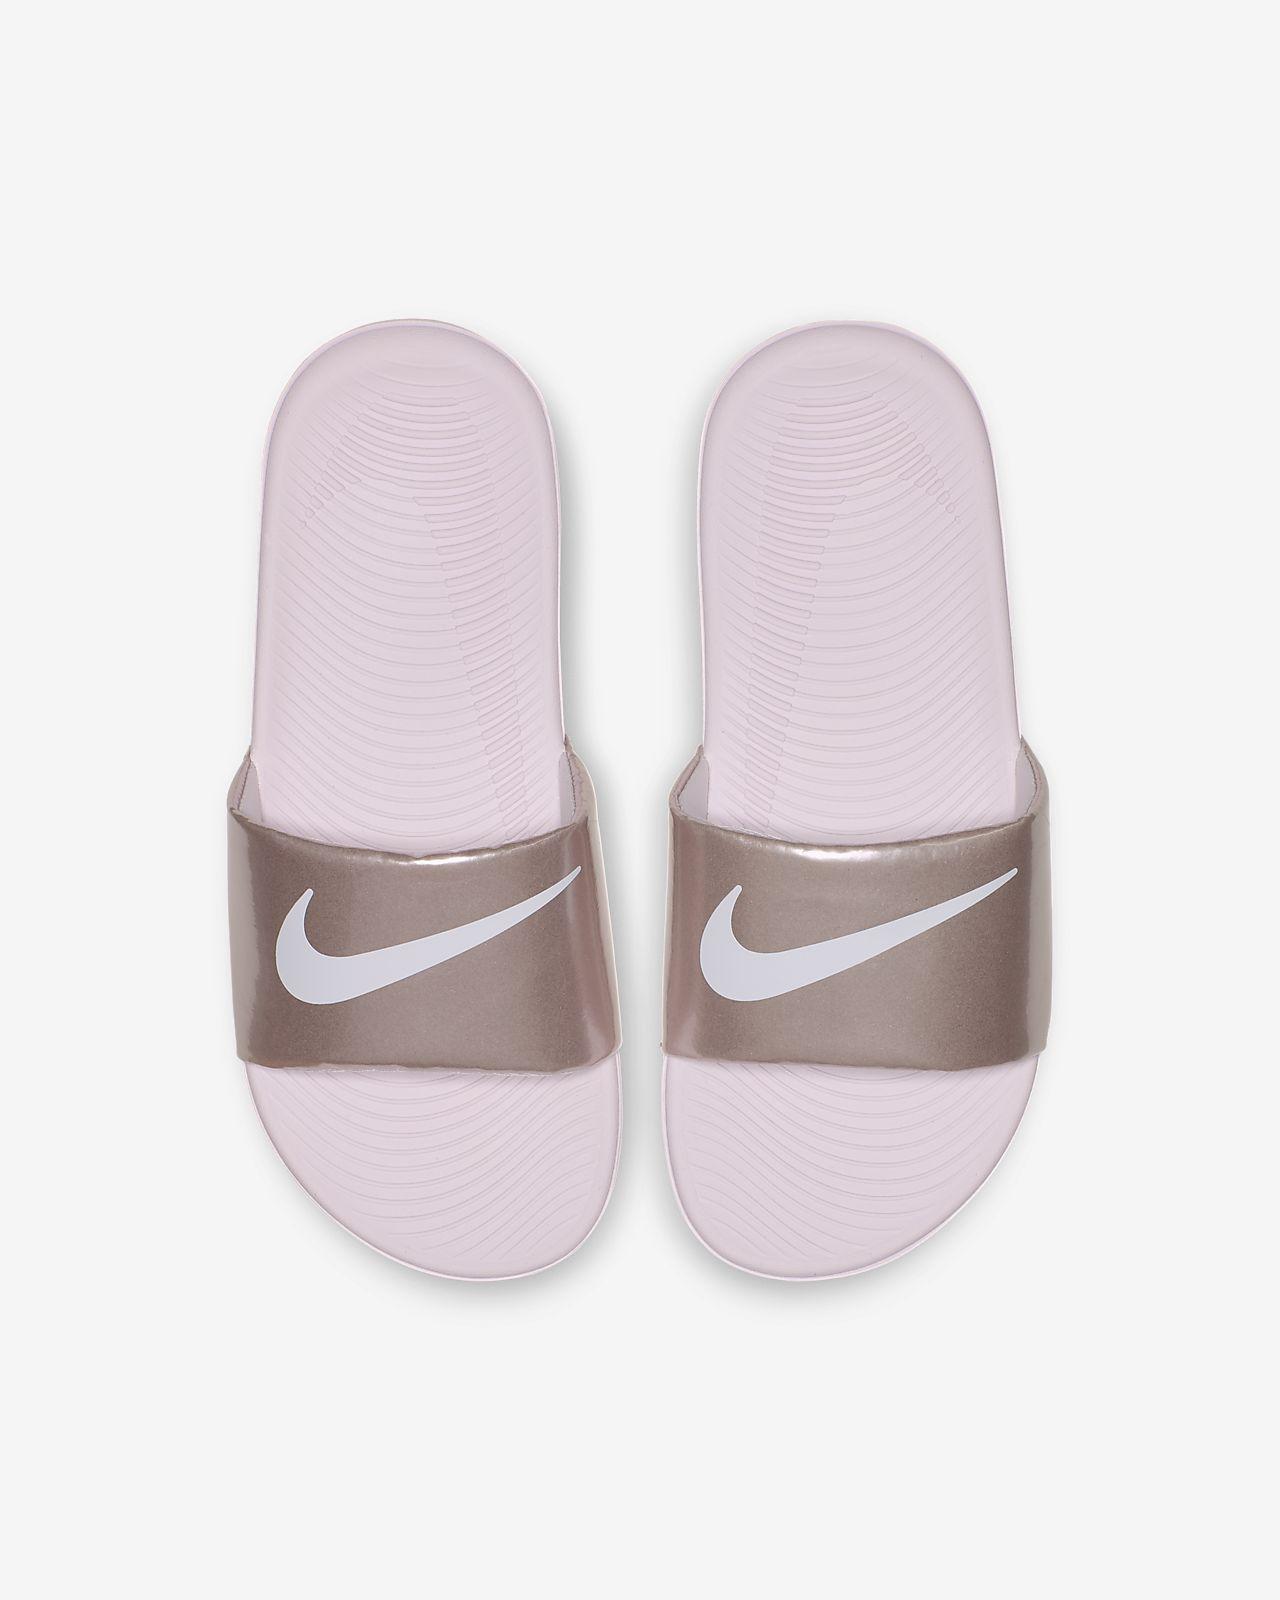 08c3b70ab96f Nike Kawa Little Big Kids  Slide. Nike.com